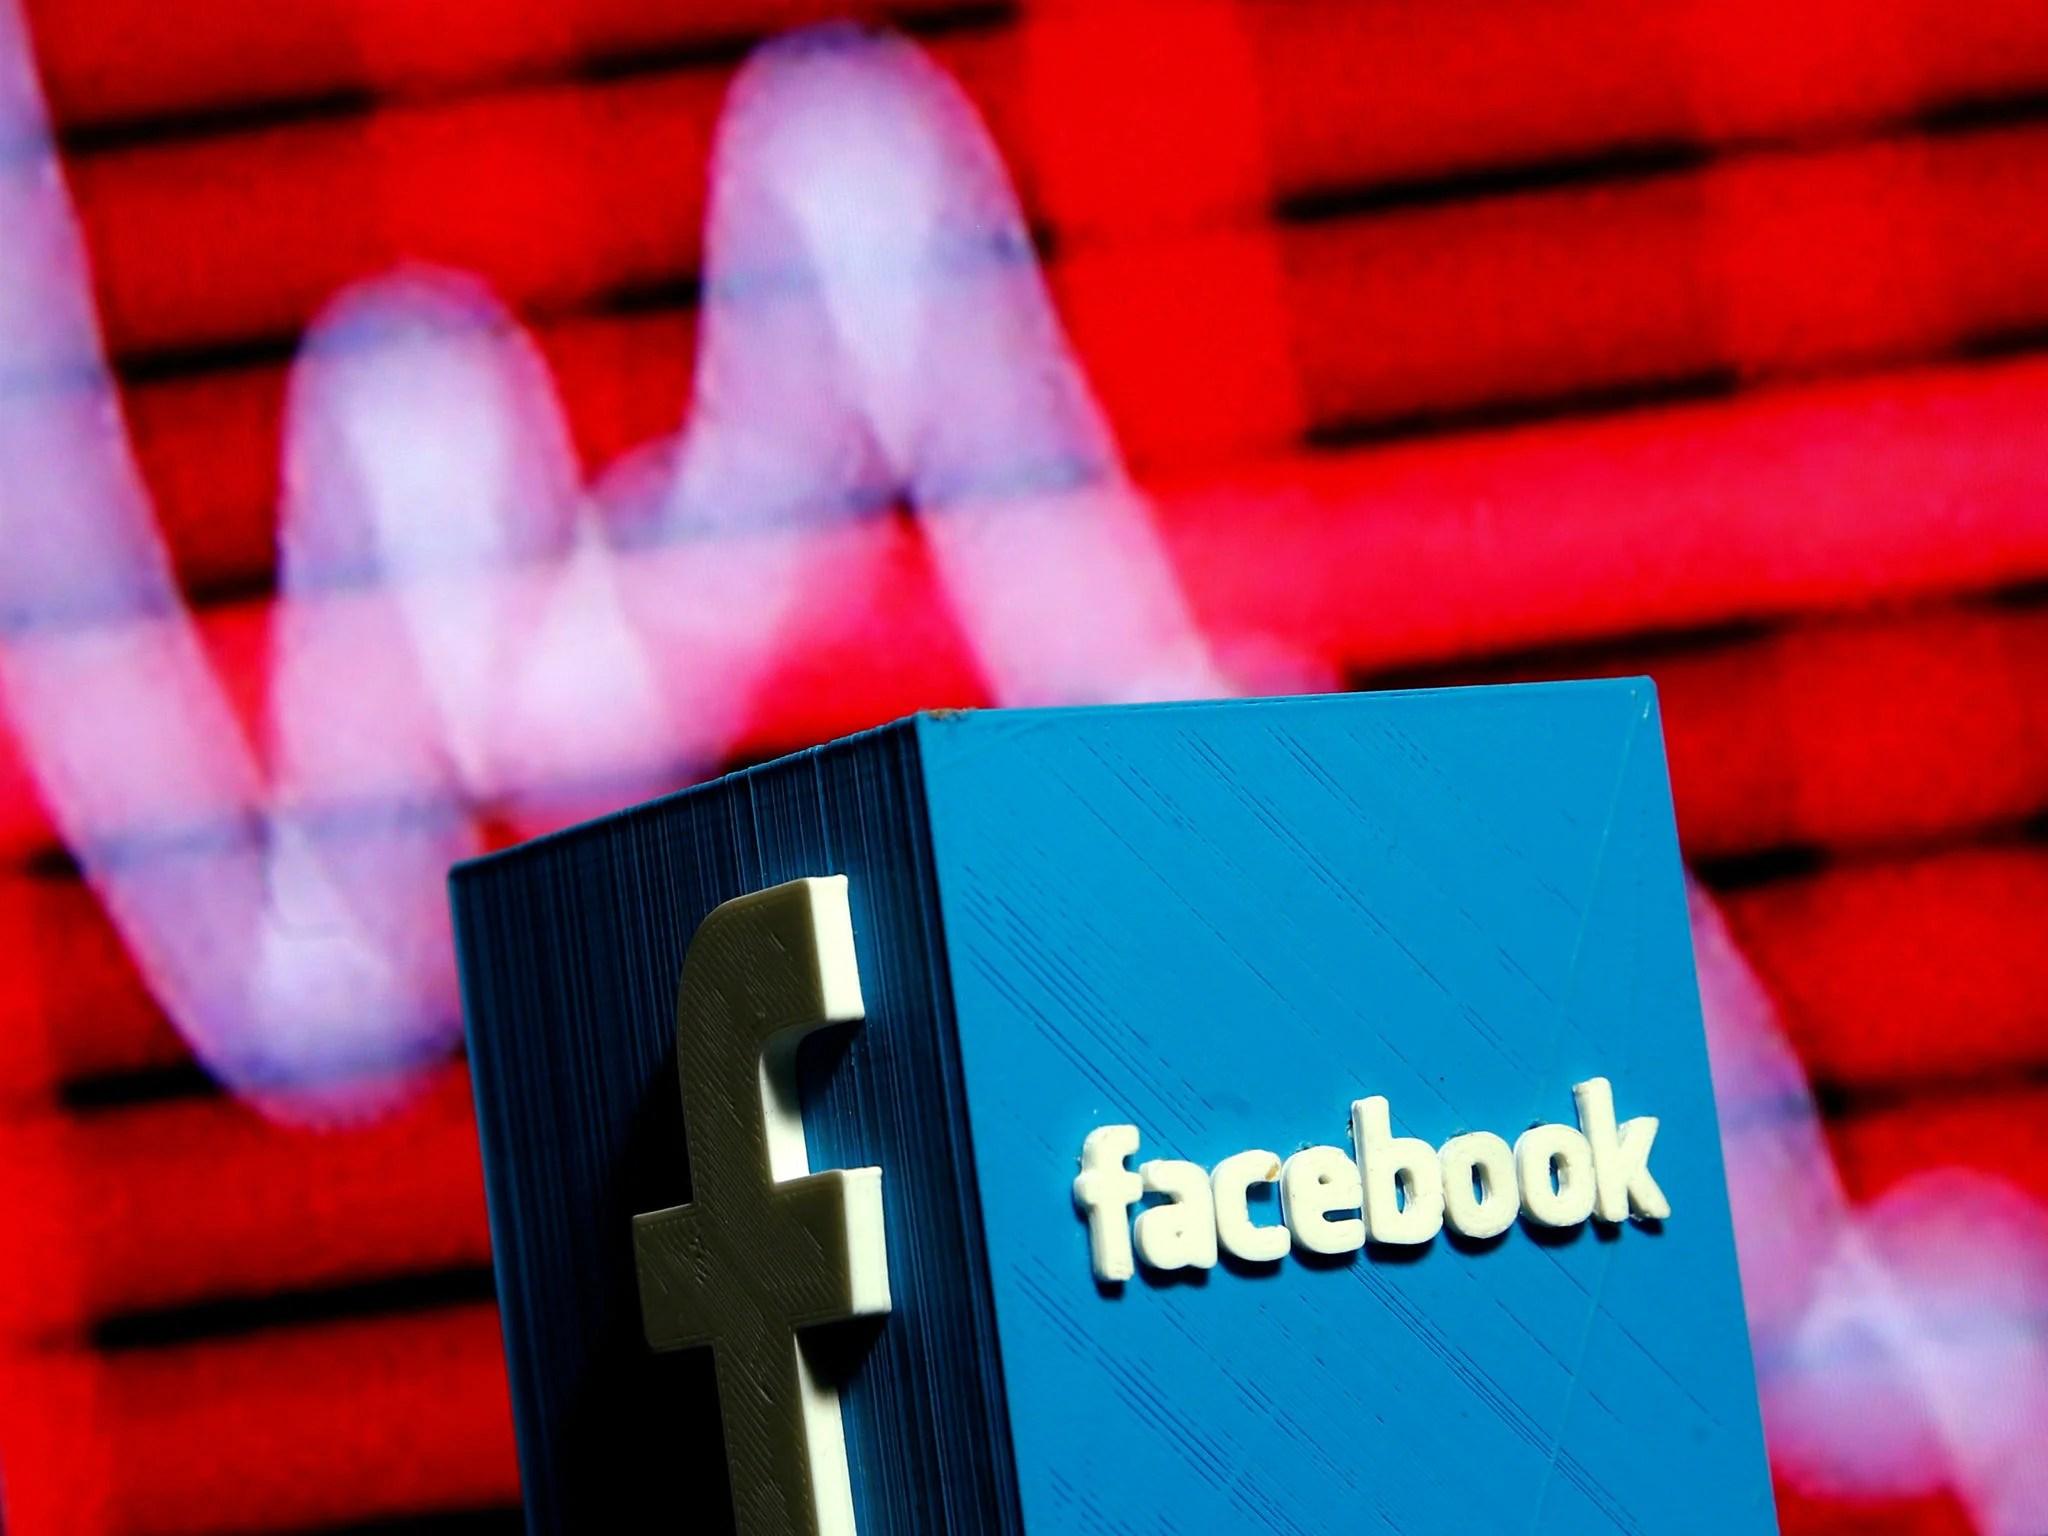 facebook stock value plunges